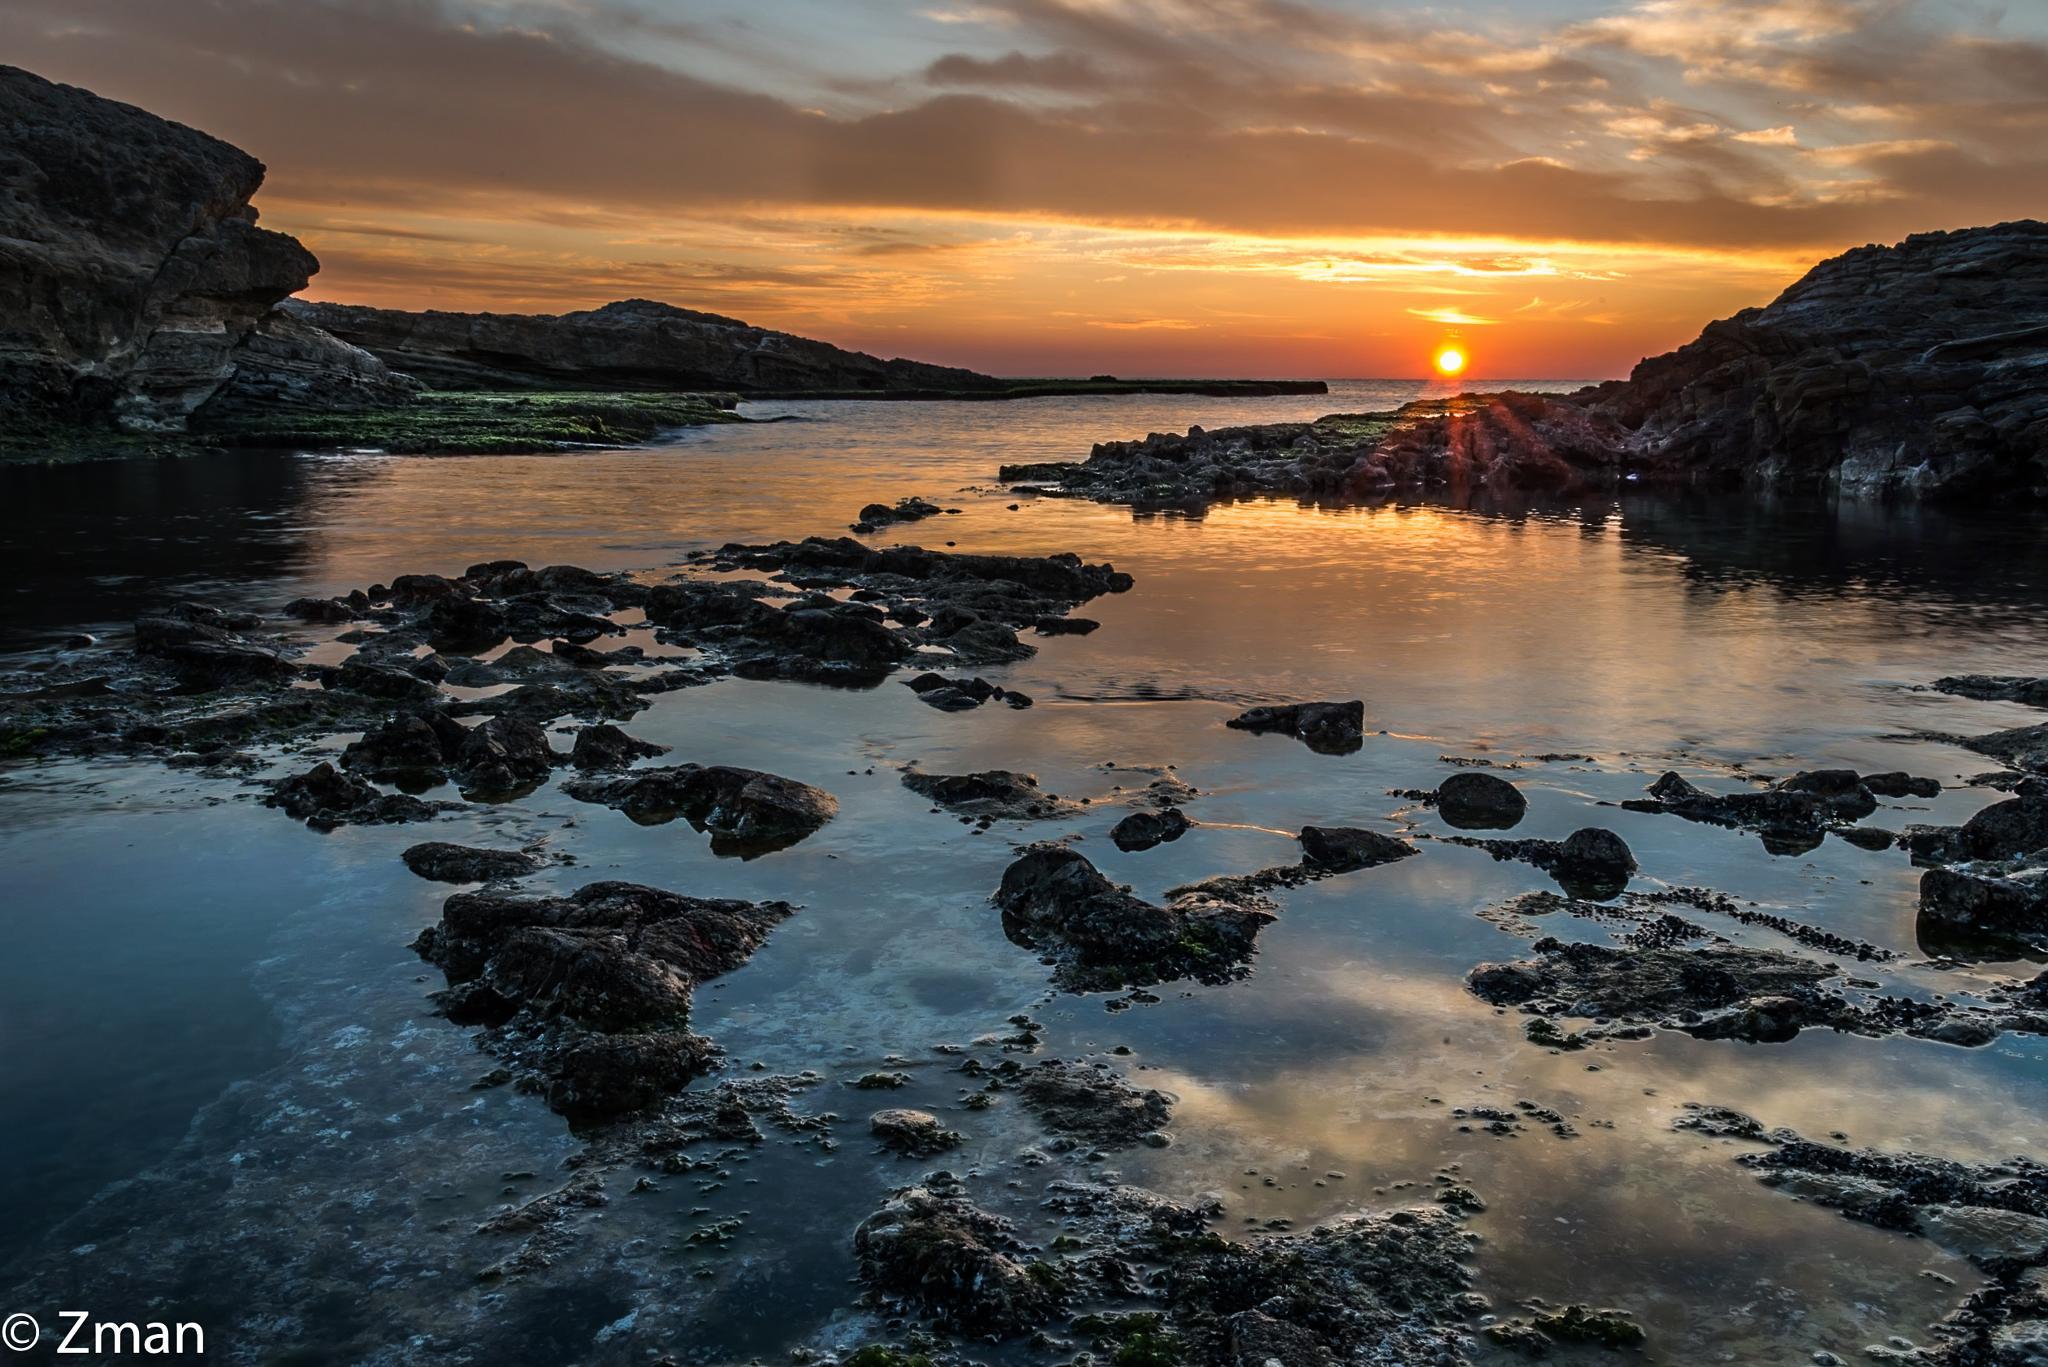 Sunset At Al Rawshe Rocks 03 by muhammad.nasser.963